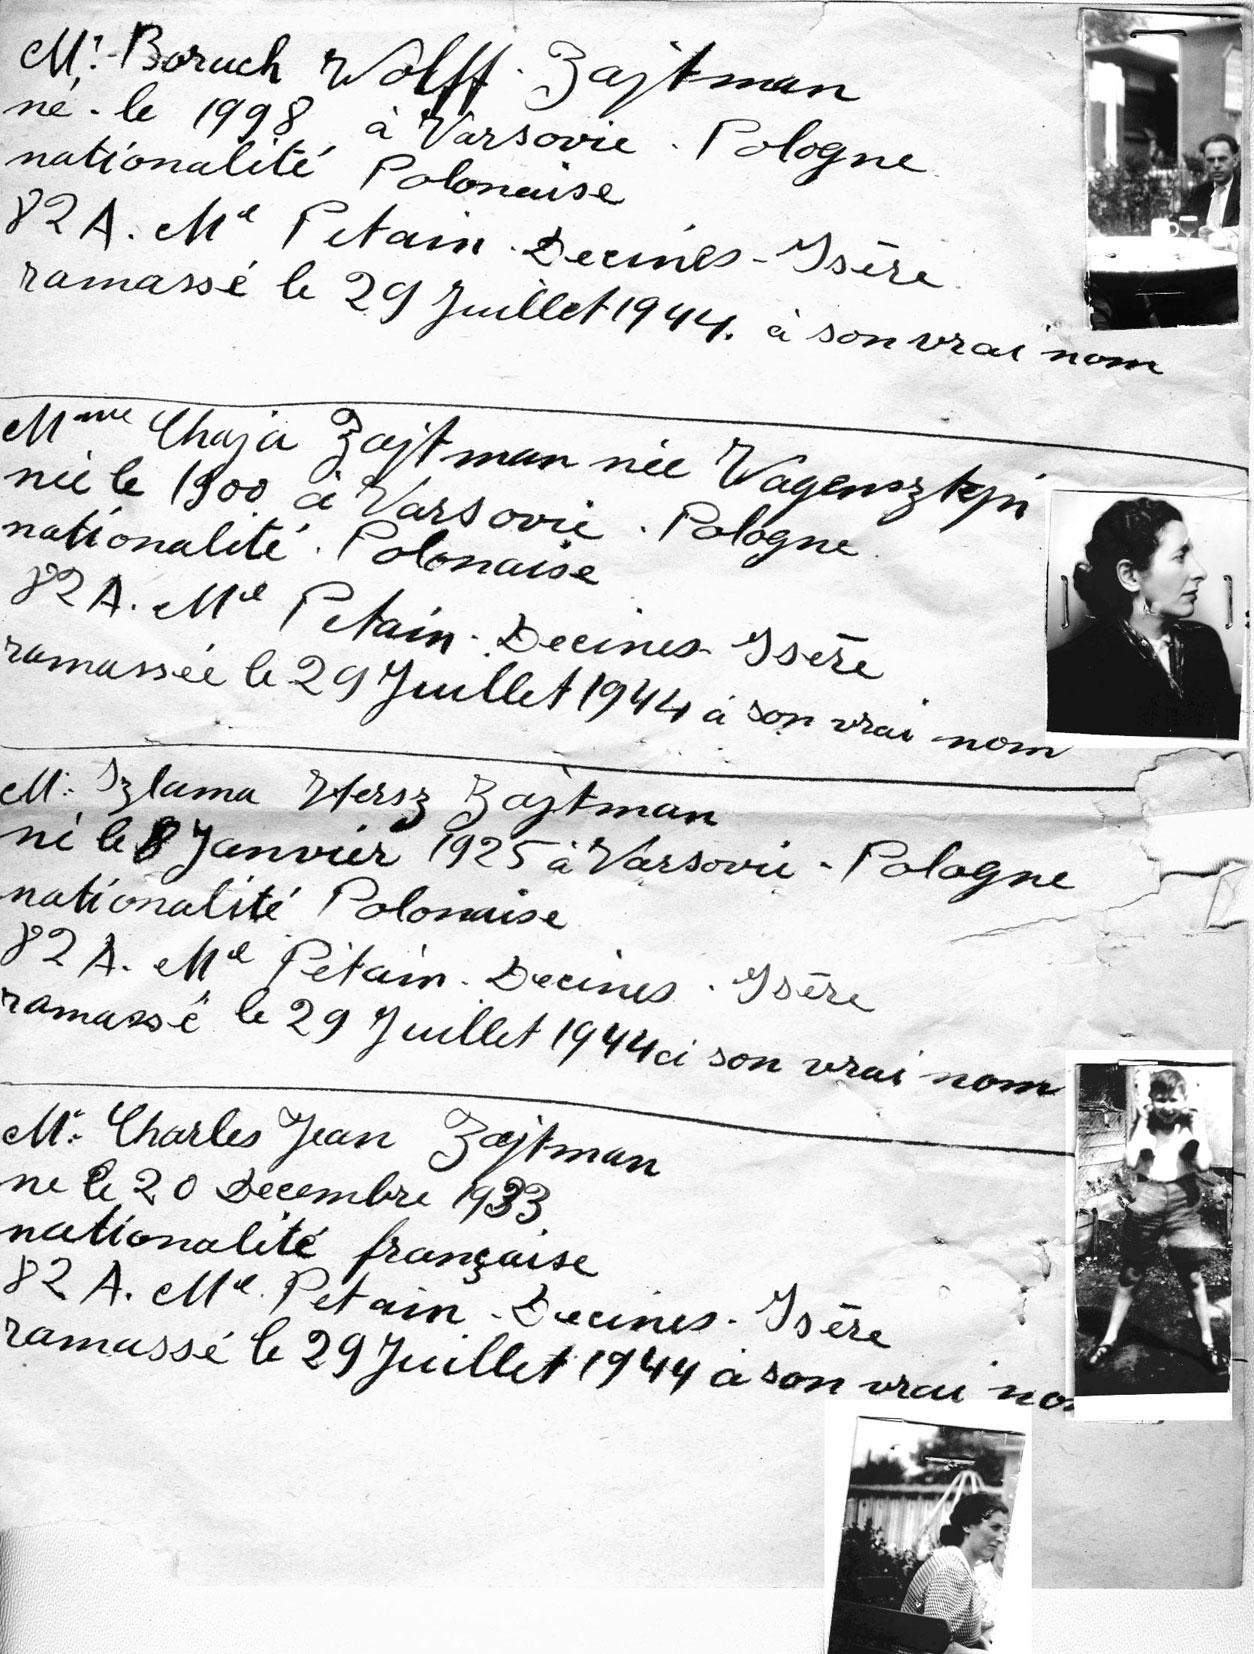 Informations sur Boruch, Chaja, Izlama et Charles, Zajtman, Décines